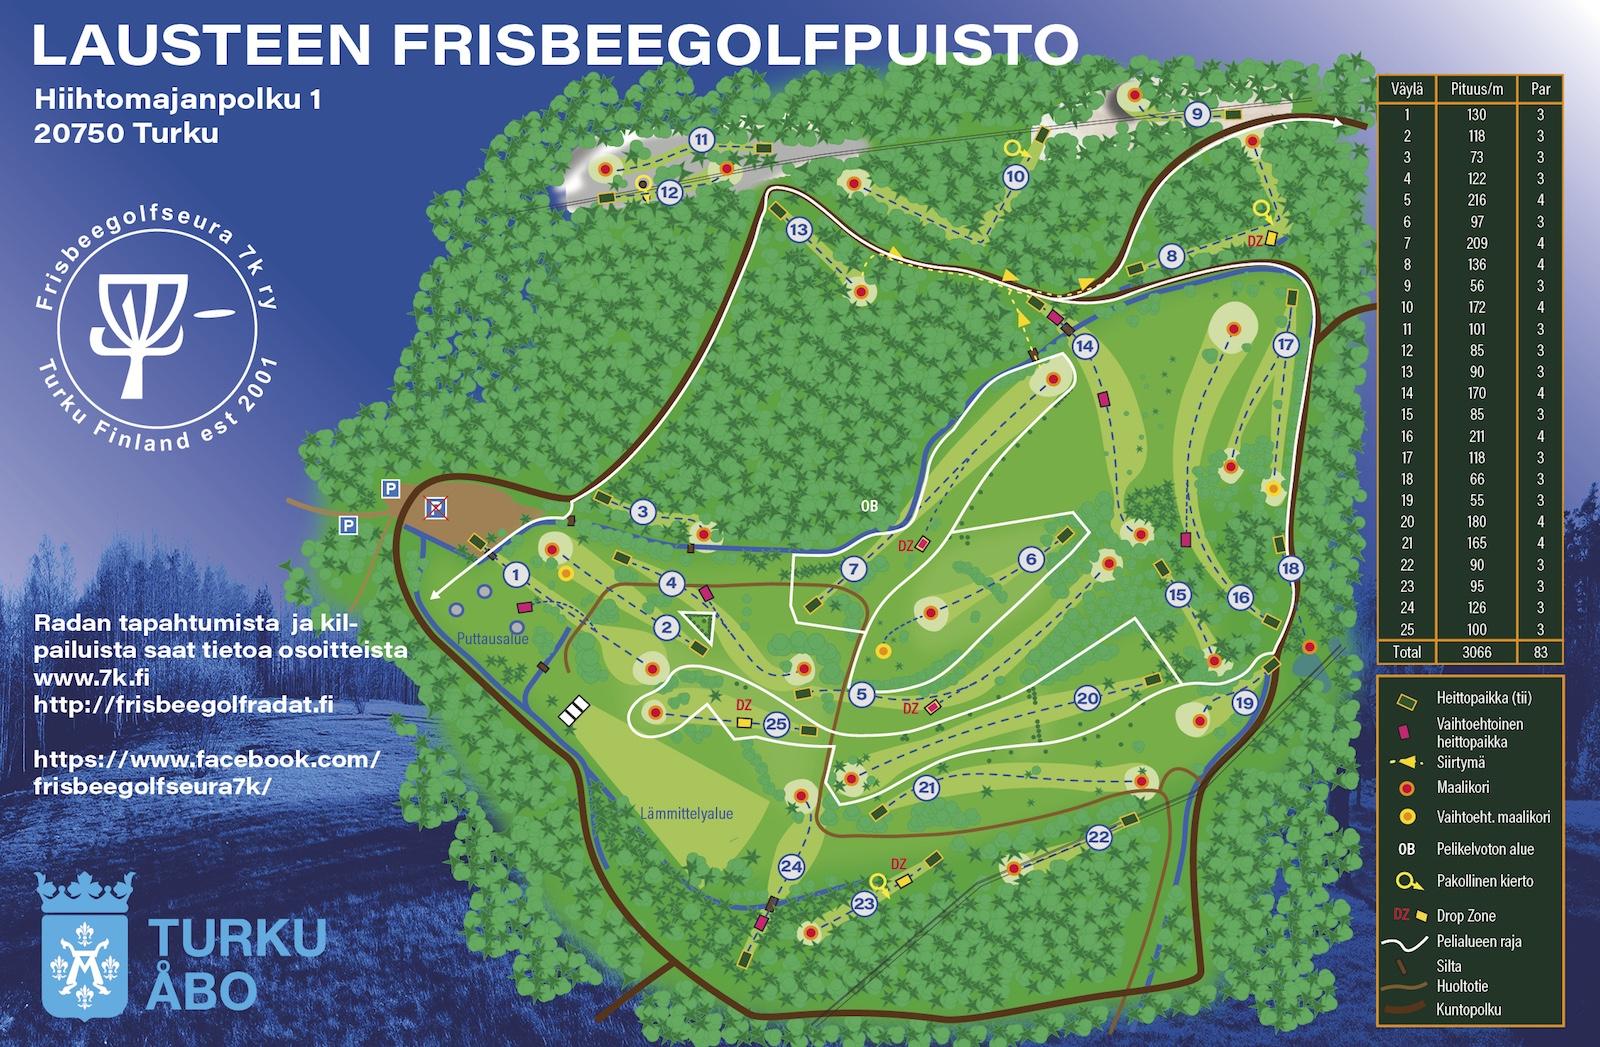 Frisbeegolf Englanniksi